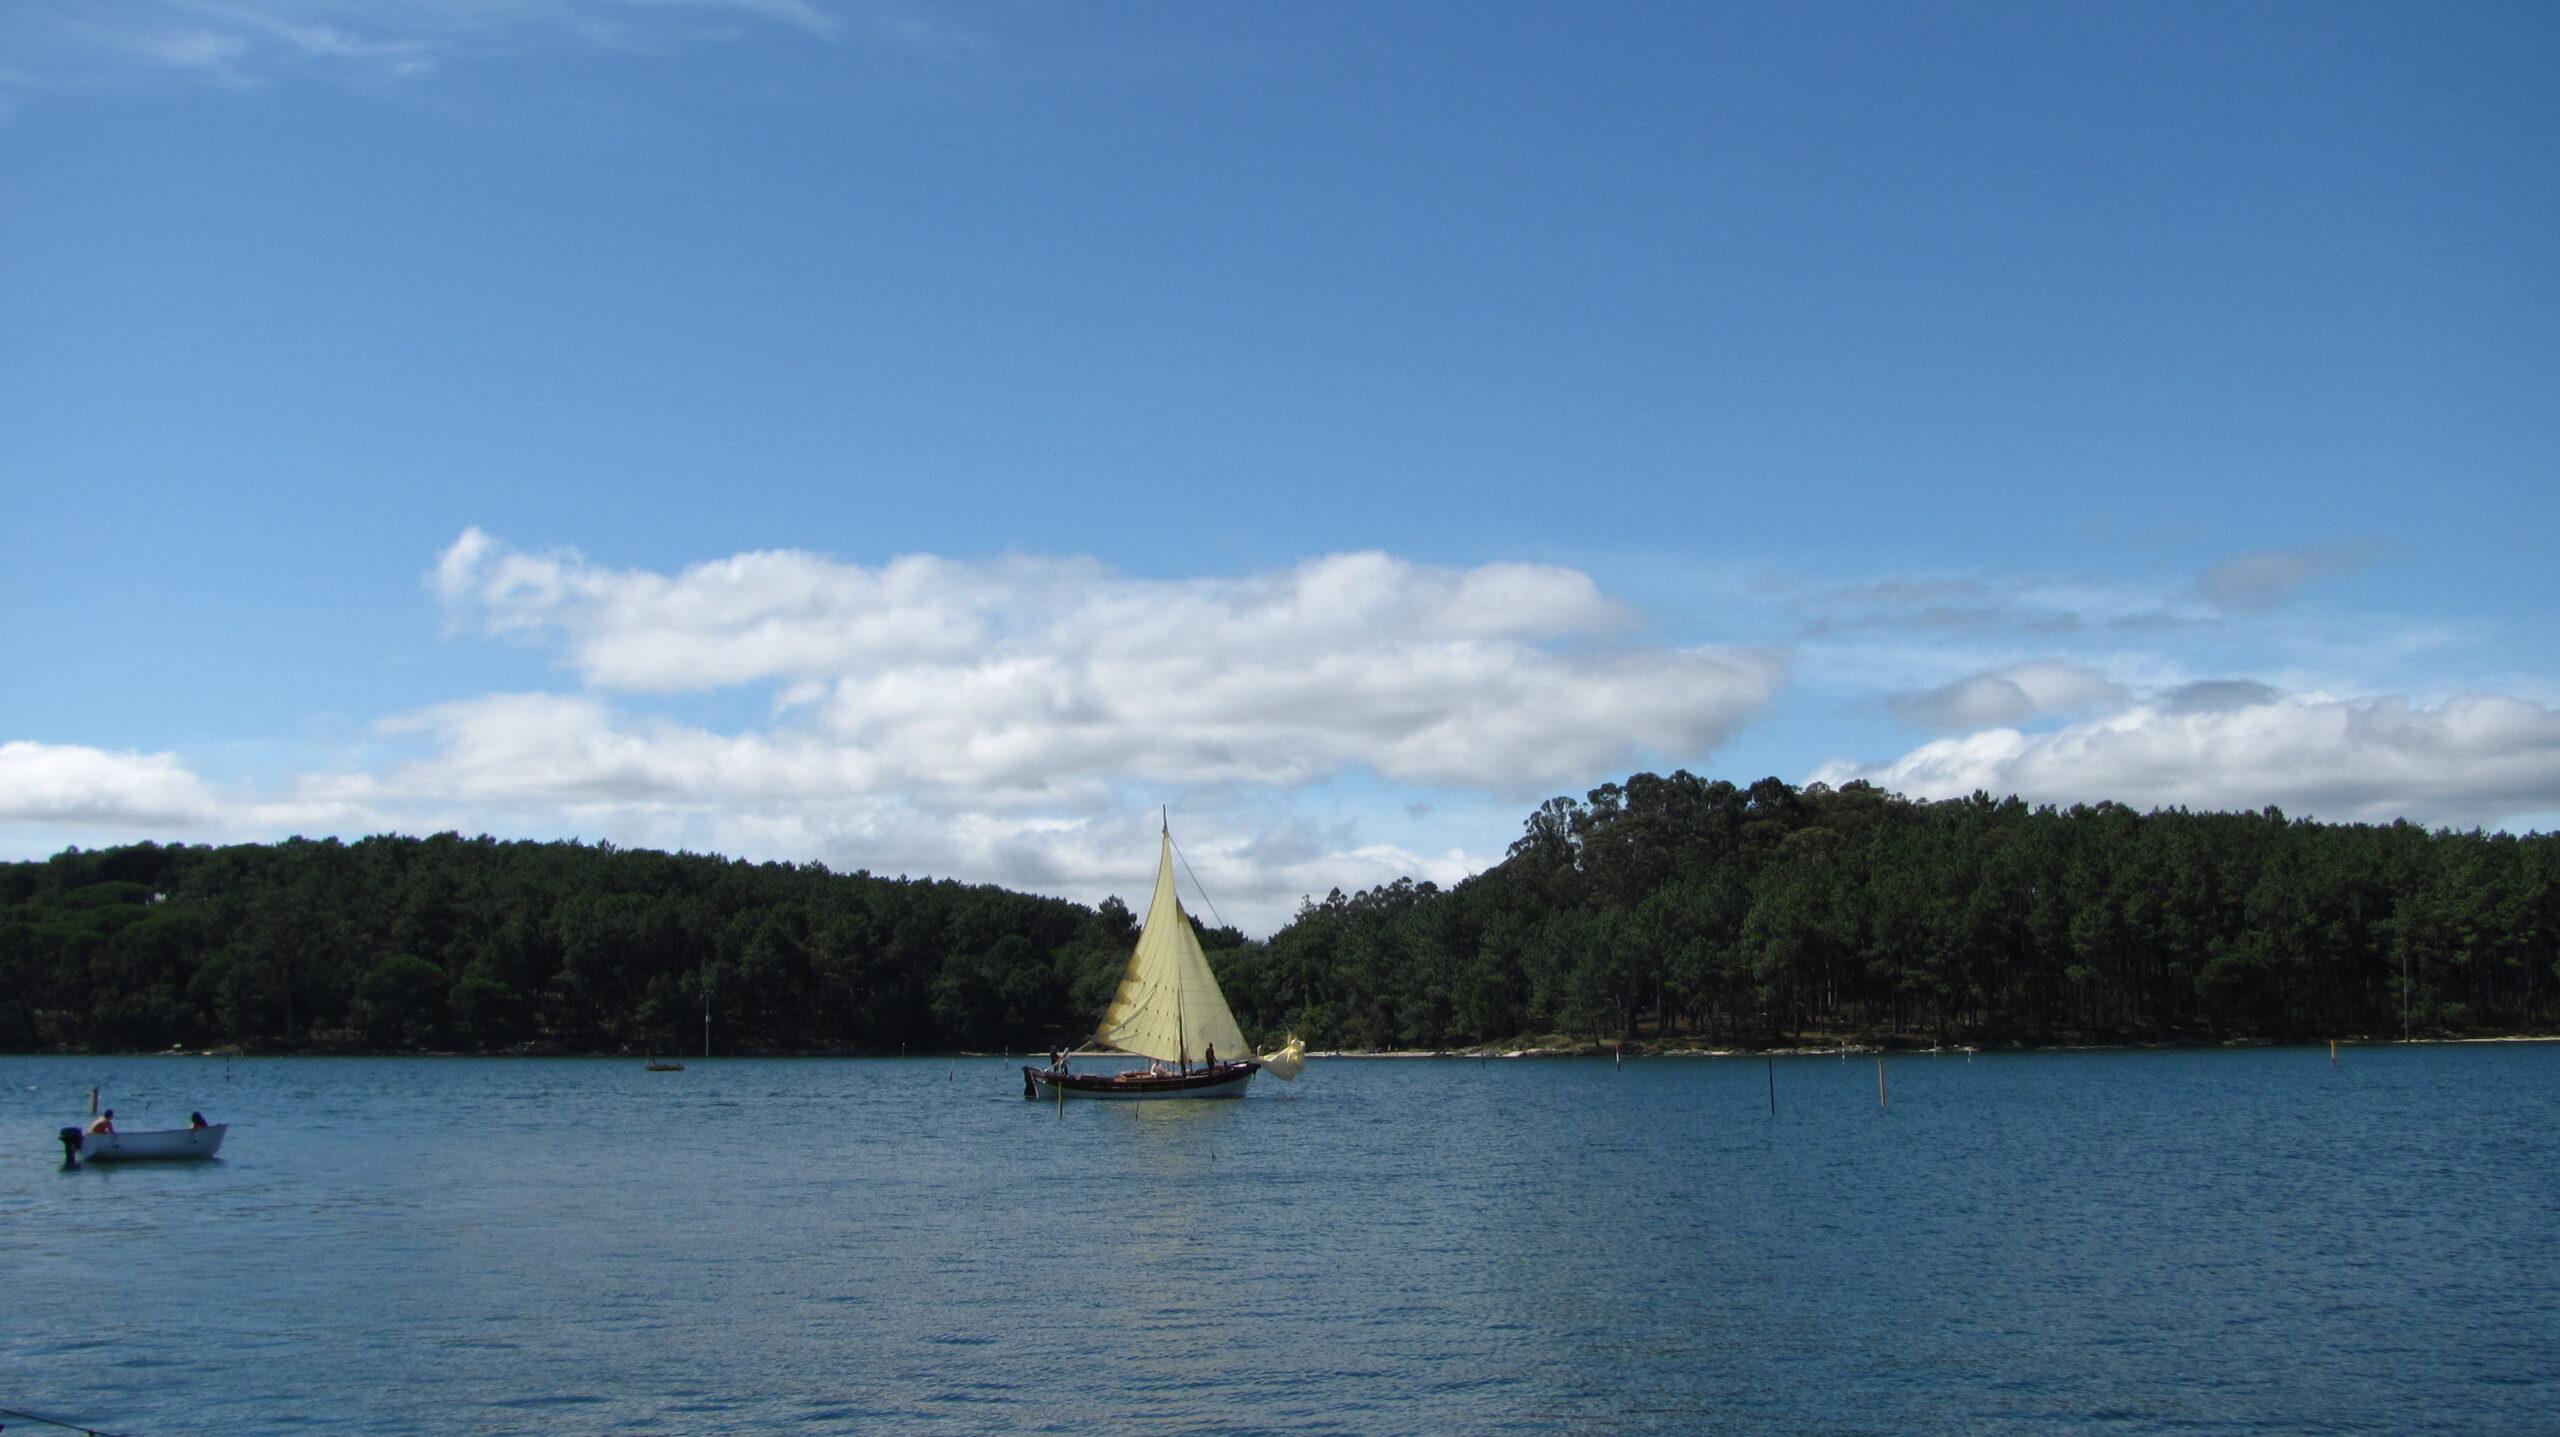 Vista_cortegada_ desde_ carril_Sailway_Sailing_Holidays_Charter_Galicia